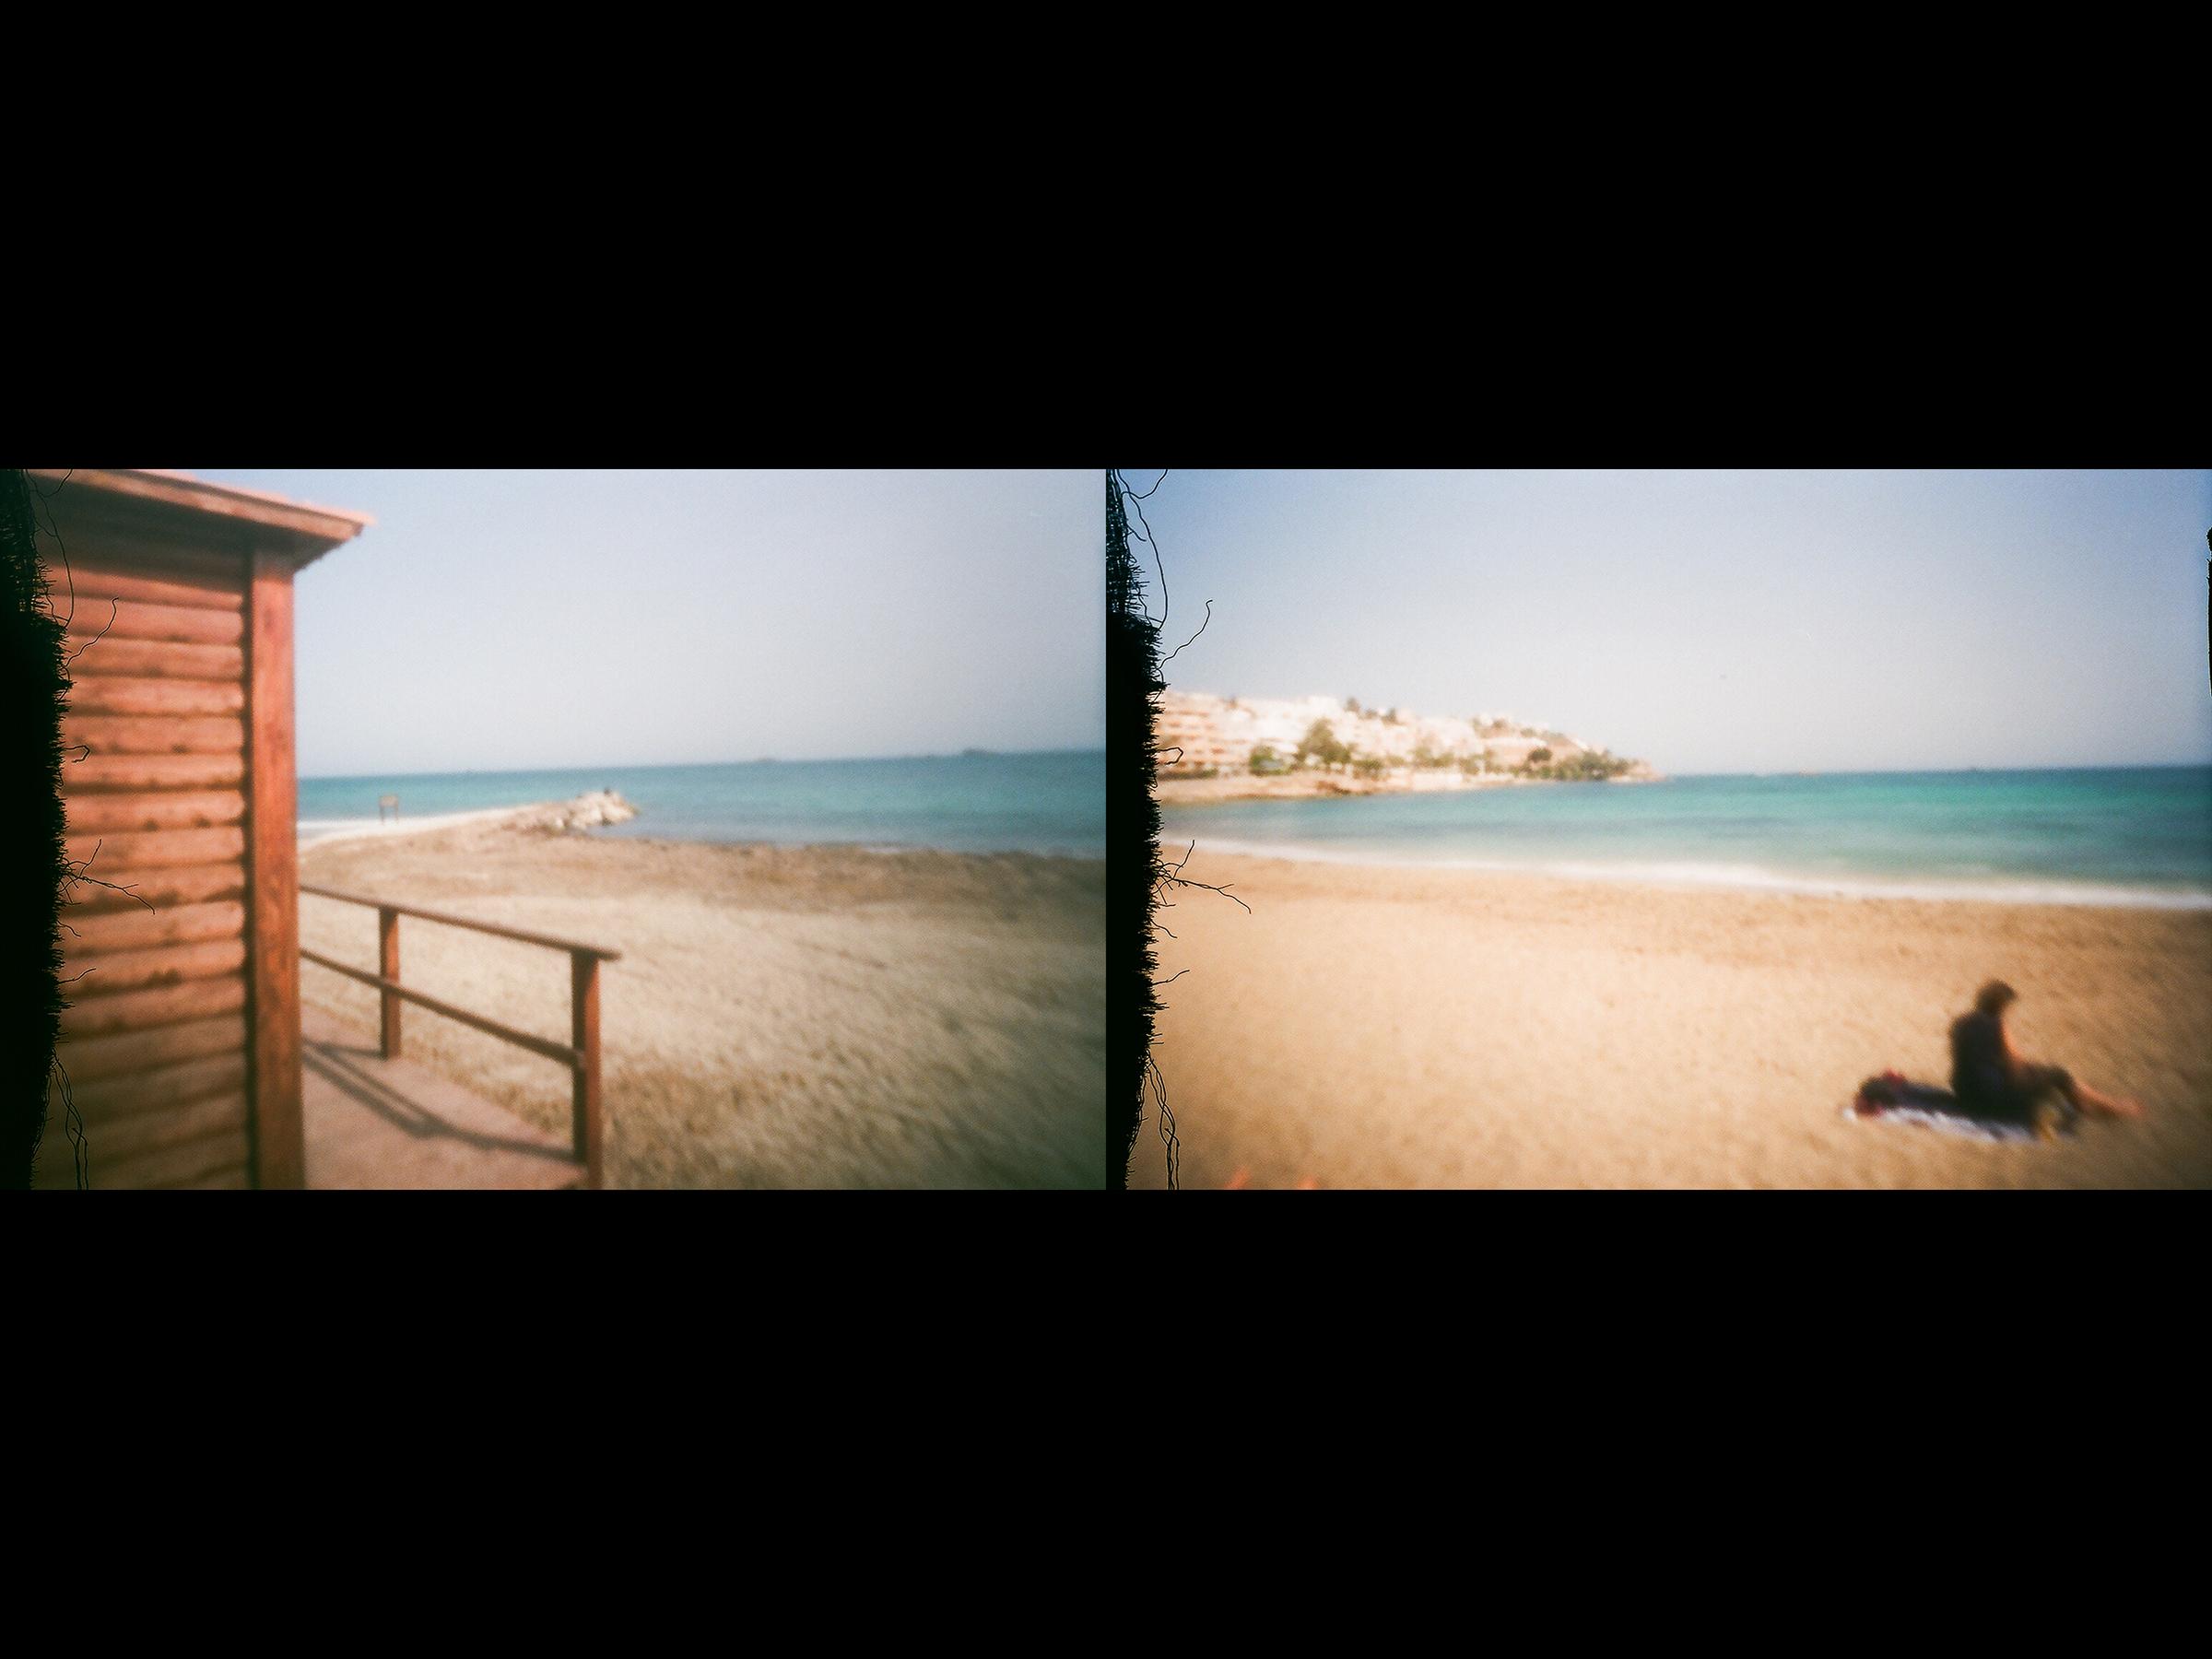 Photographs from 35mm pinhole camera.